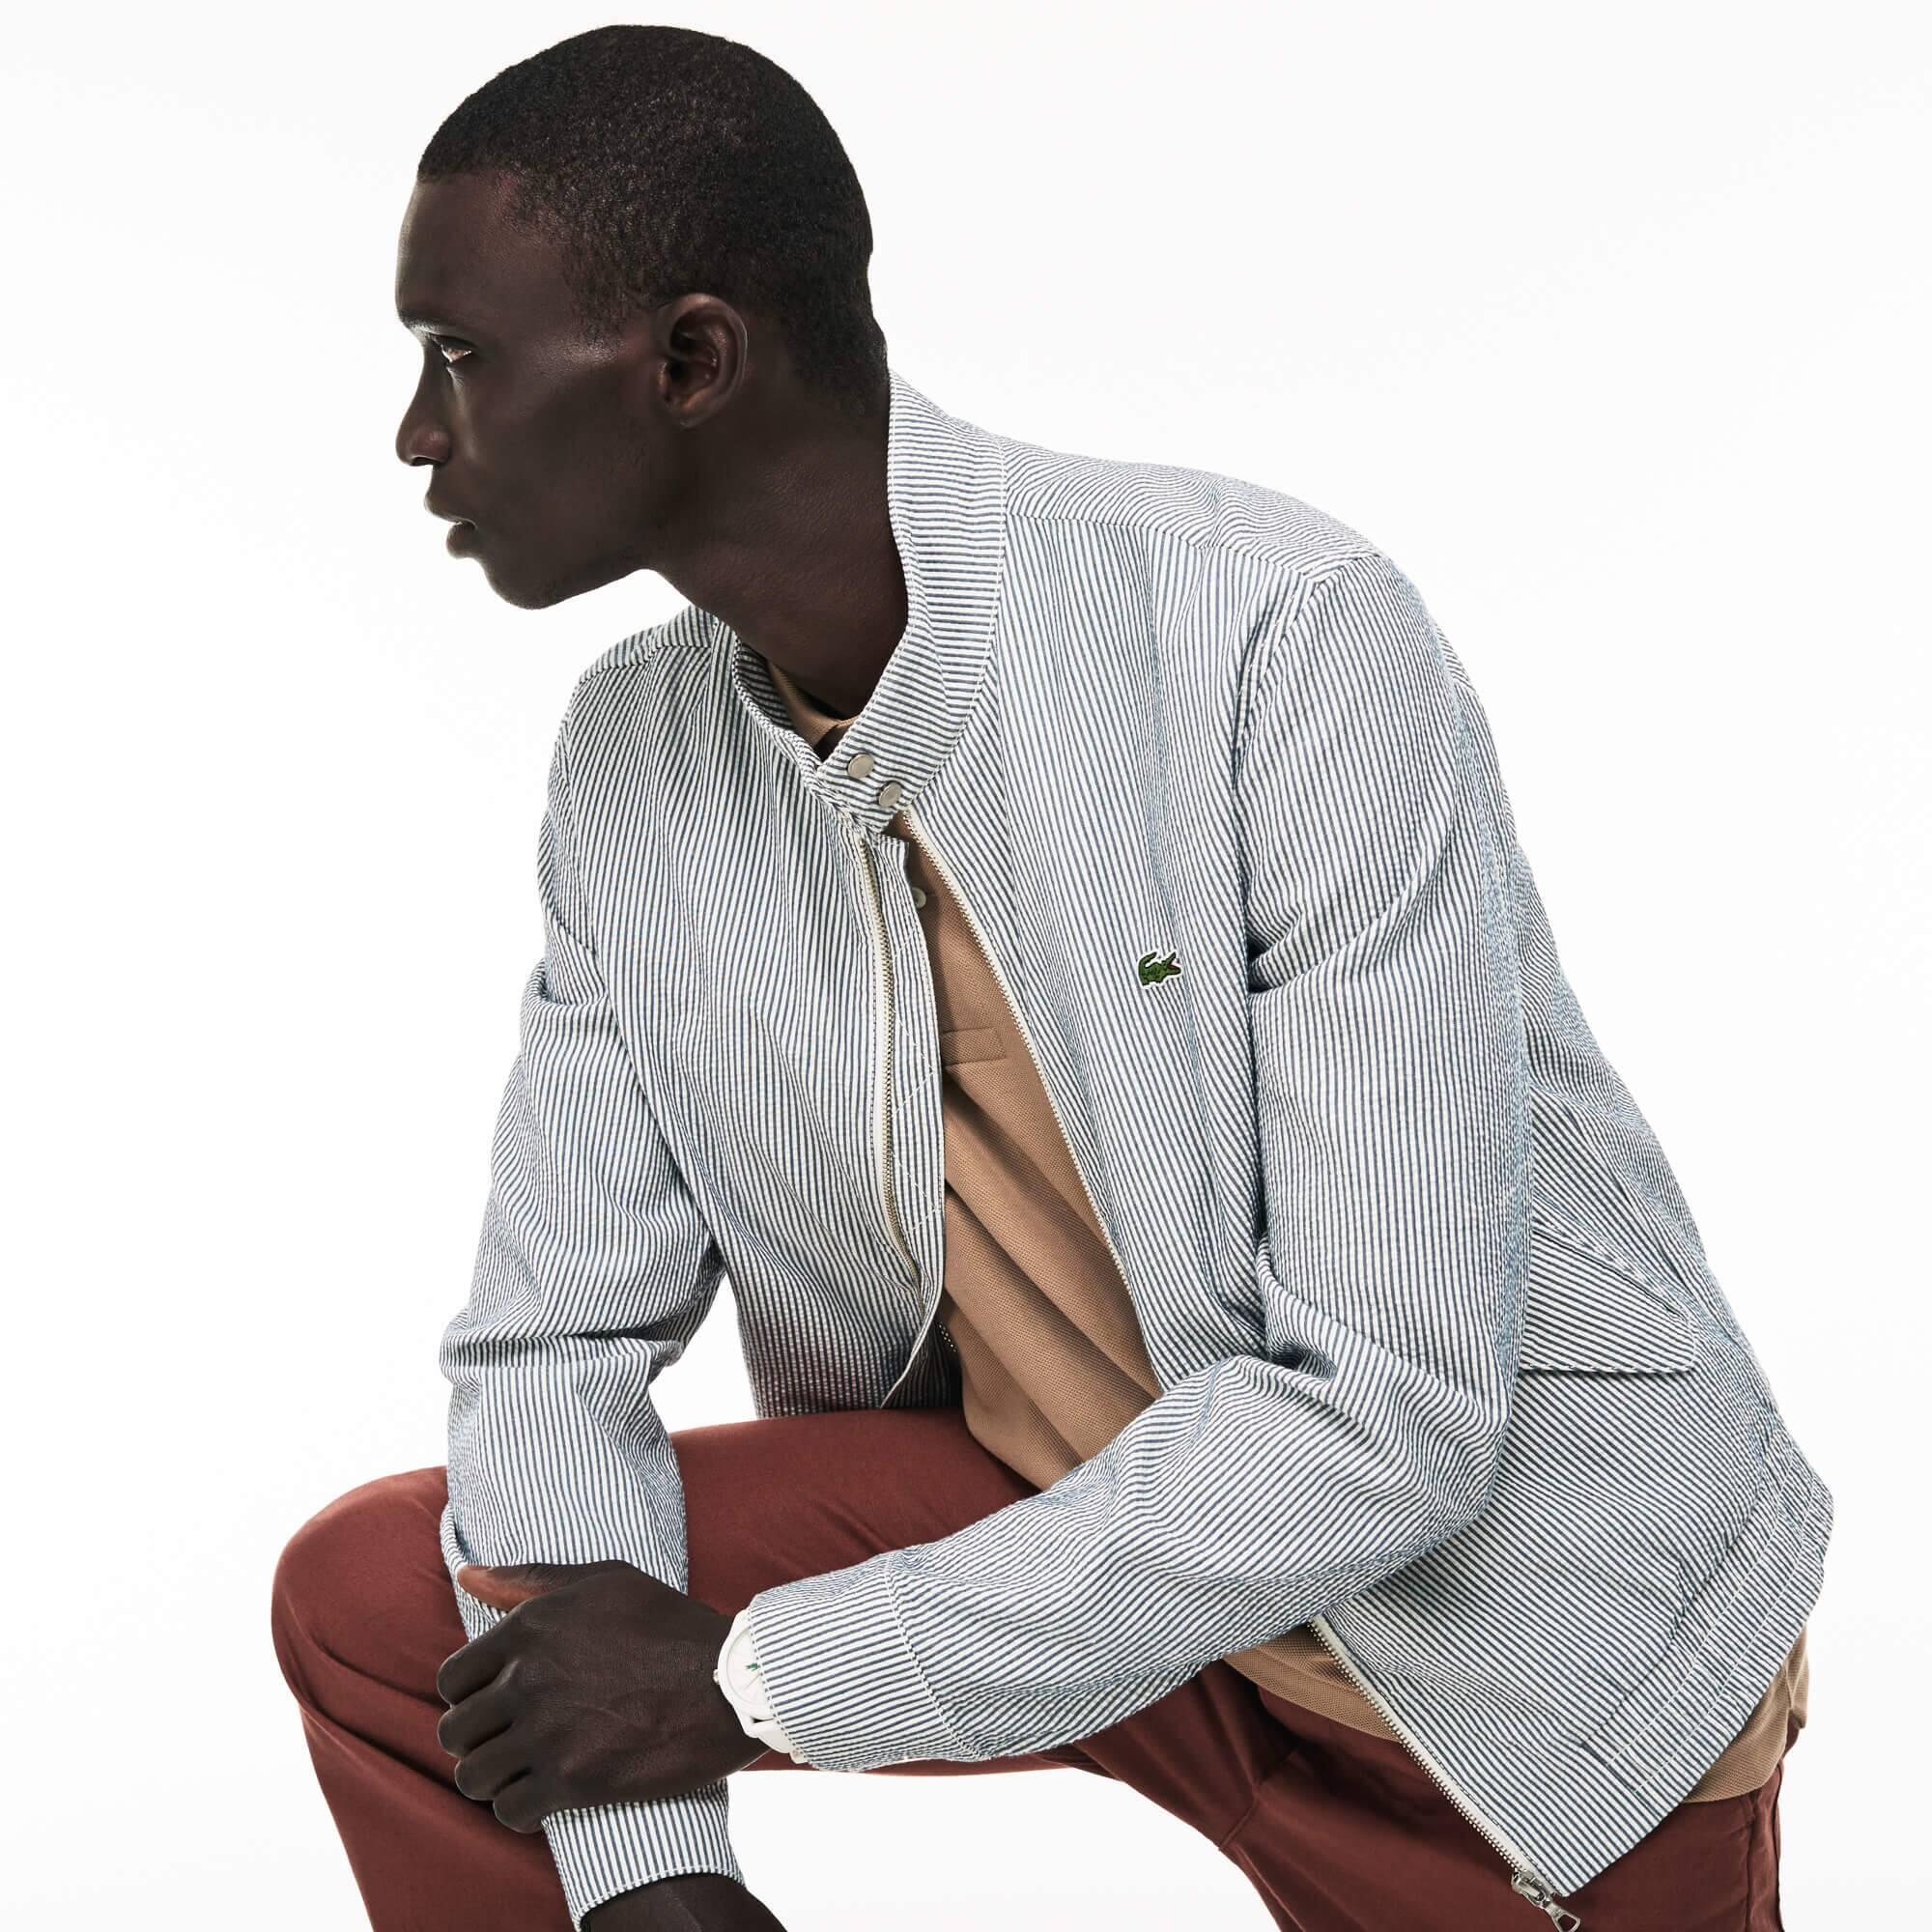 Kurze Herren-Jacke aus gestreiftem Seersucker mit Reißverschluss